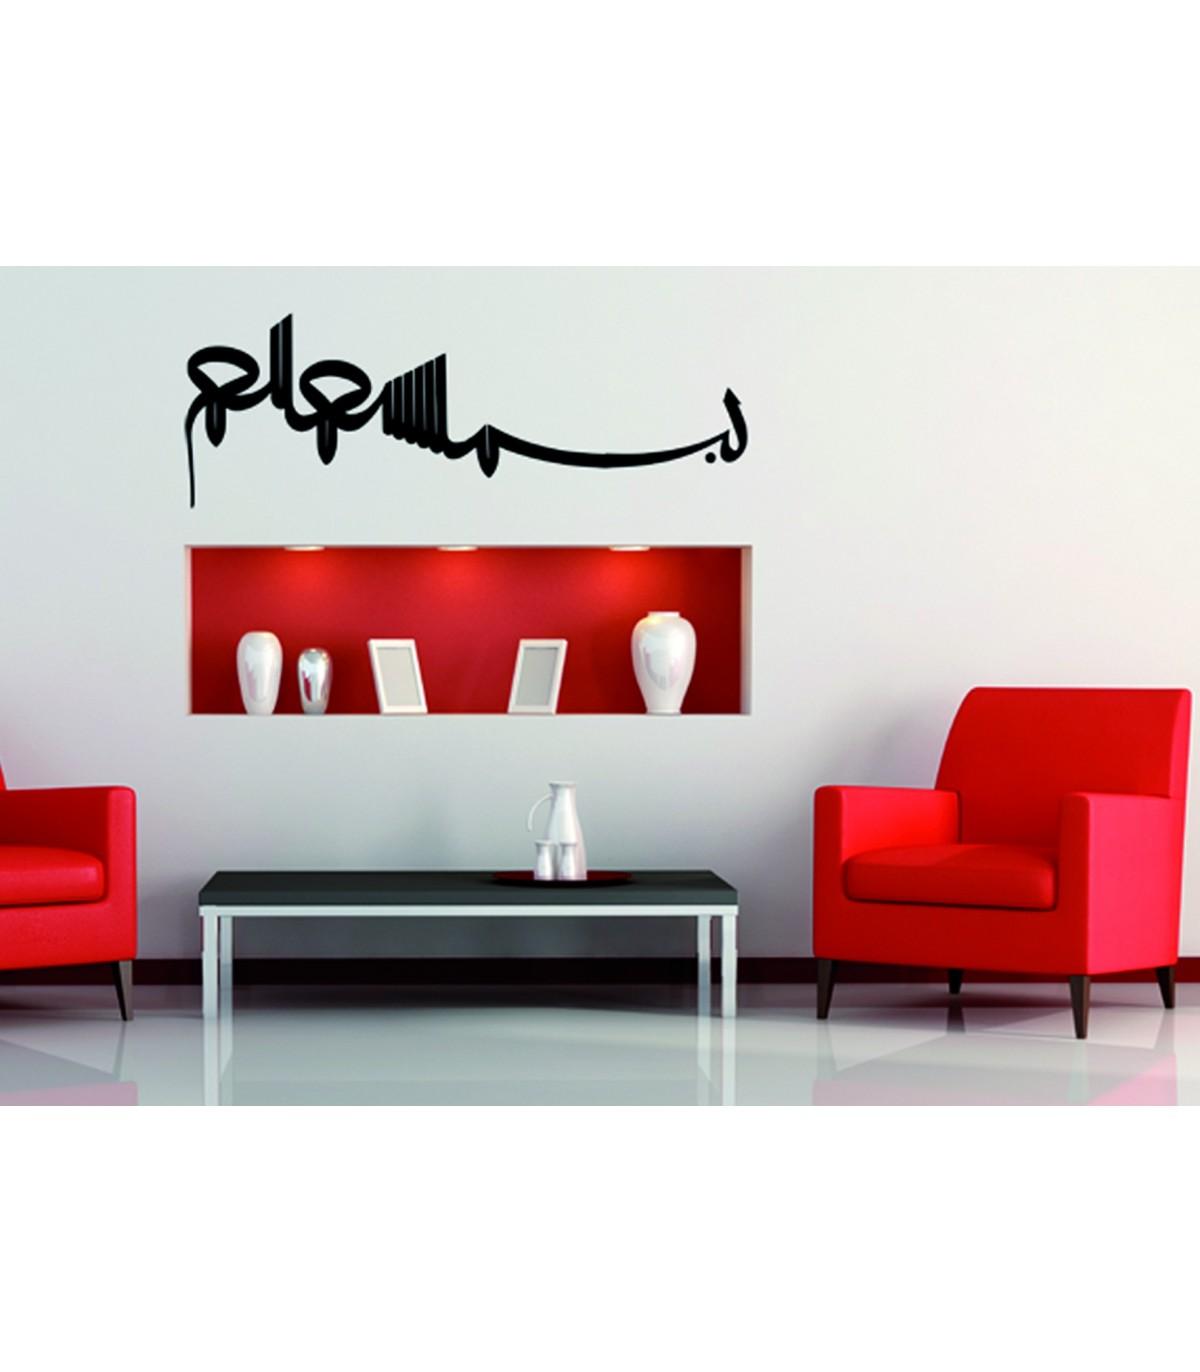 Comprar Vinilos Online.Basmalah Riqa Vinilo Decorativo Hogar Islam Comprar Online